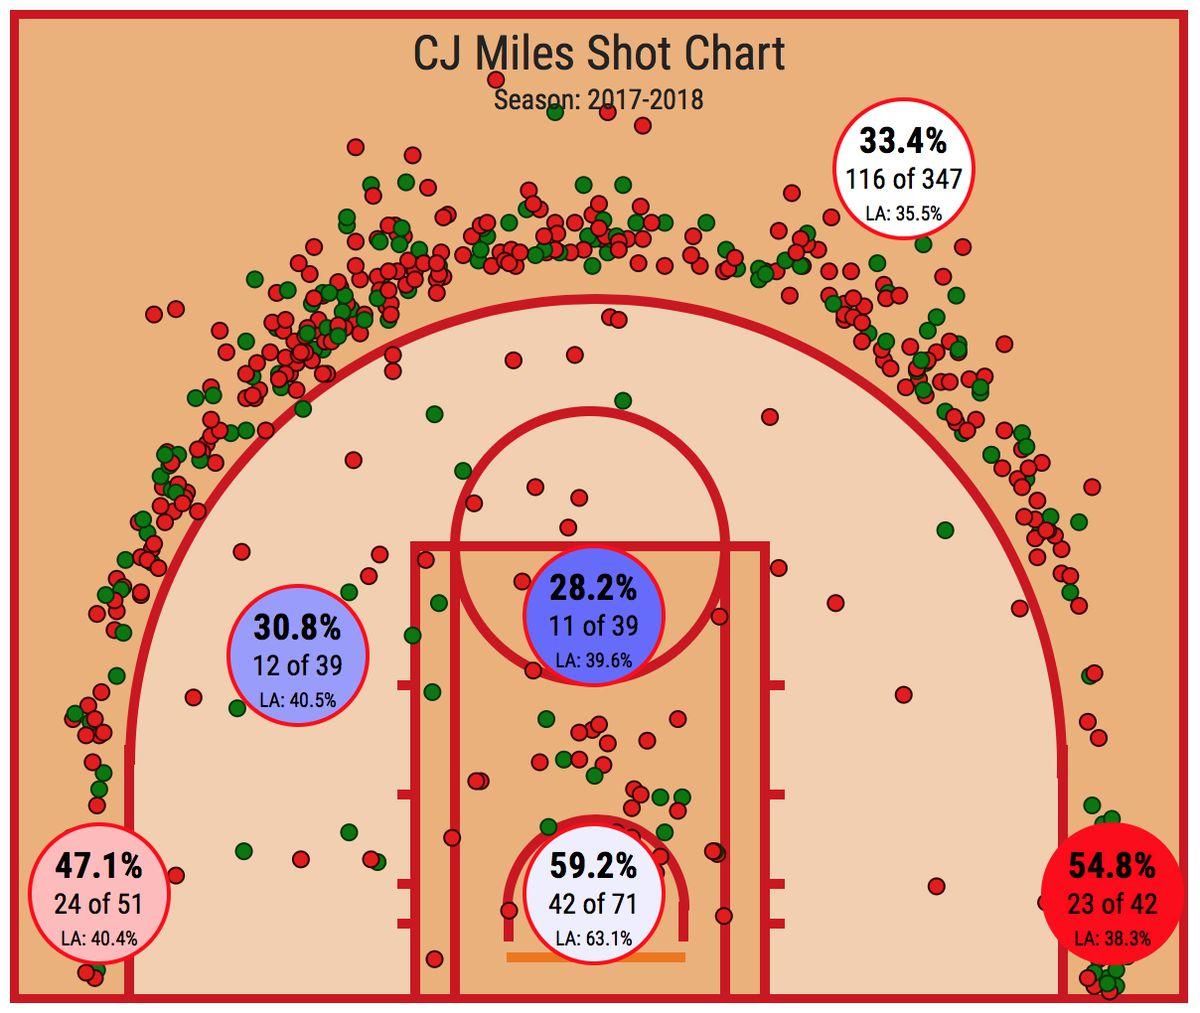 Toronto Raptors C.J. Miles 2017-18 shot chart